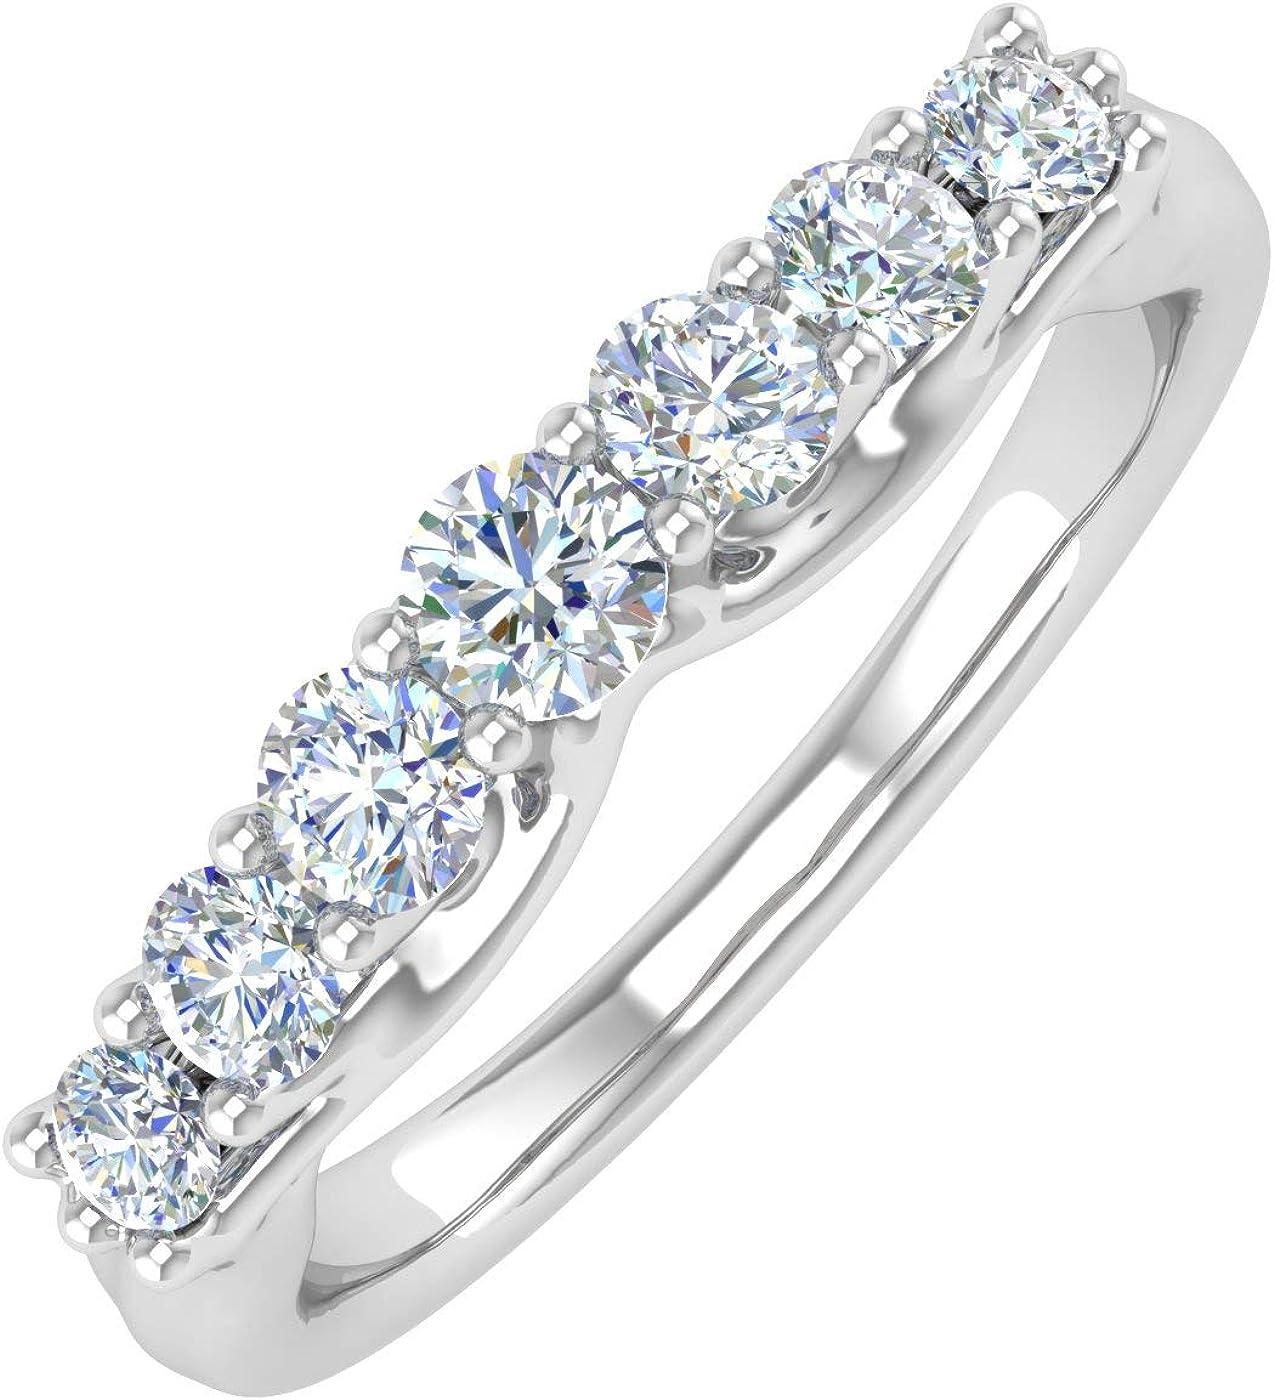 1/2 Carat 7-Stone Diamond Wedding Band Ring in 14K Gold